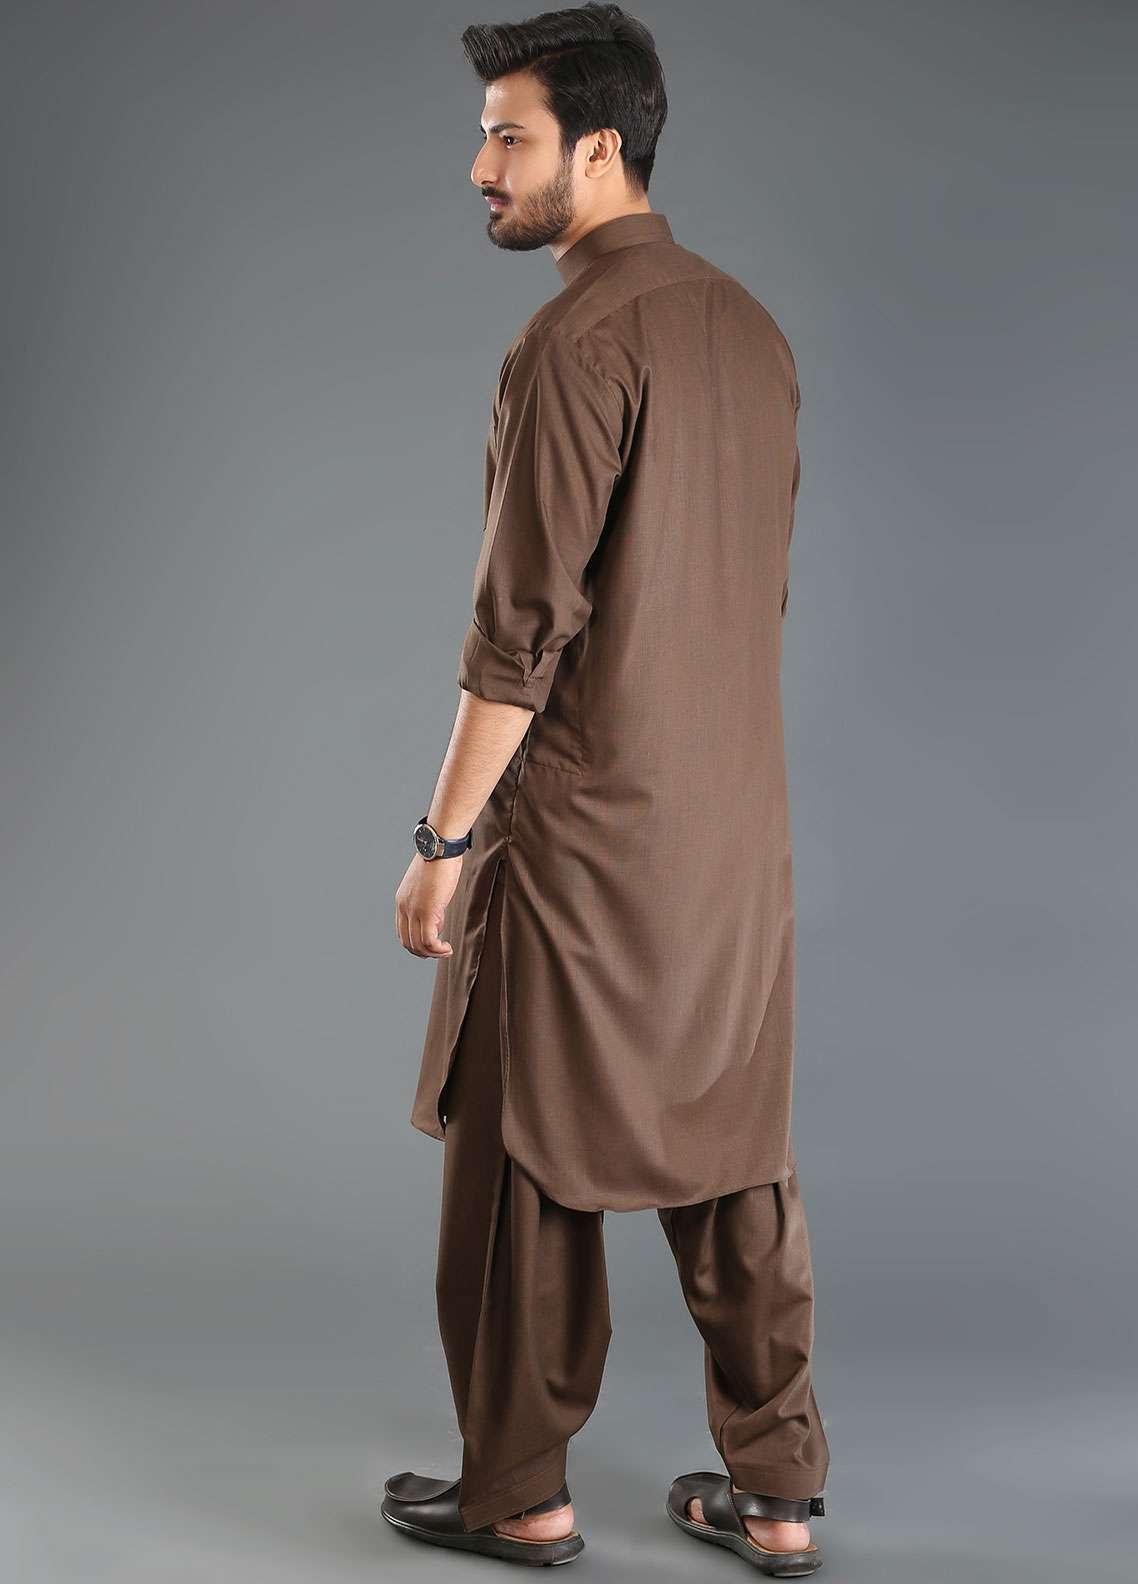 Sanaulla Exclusive Range Wash N Wear Formal Men Kameez Shalwar - Brown SKS18W 06